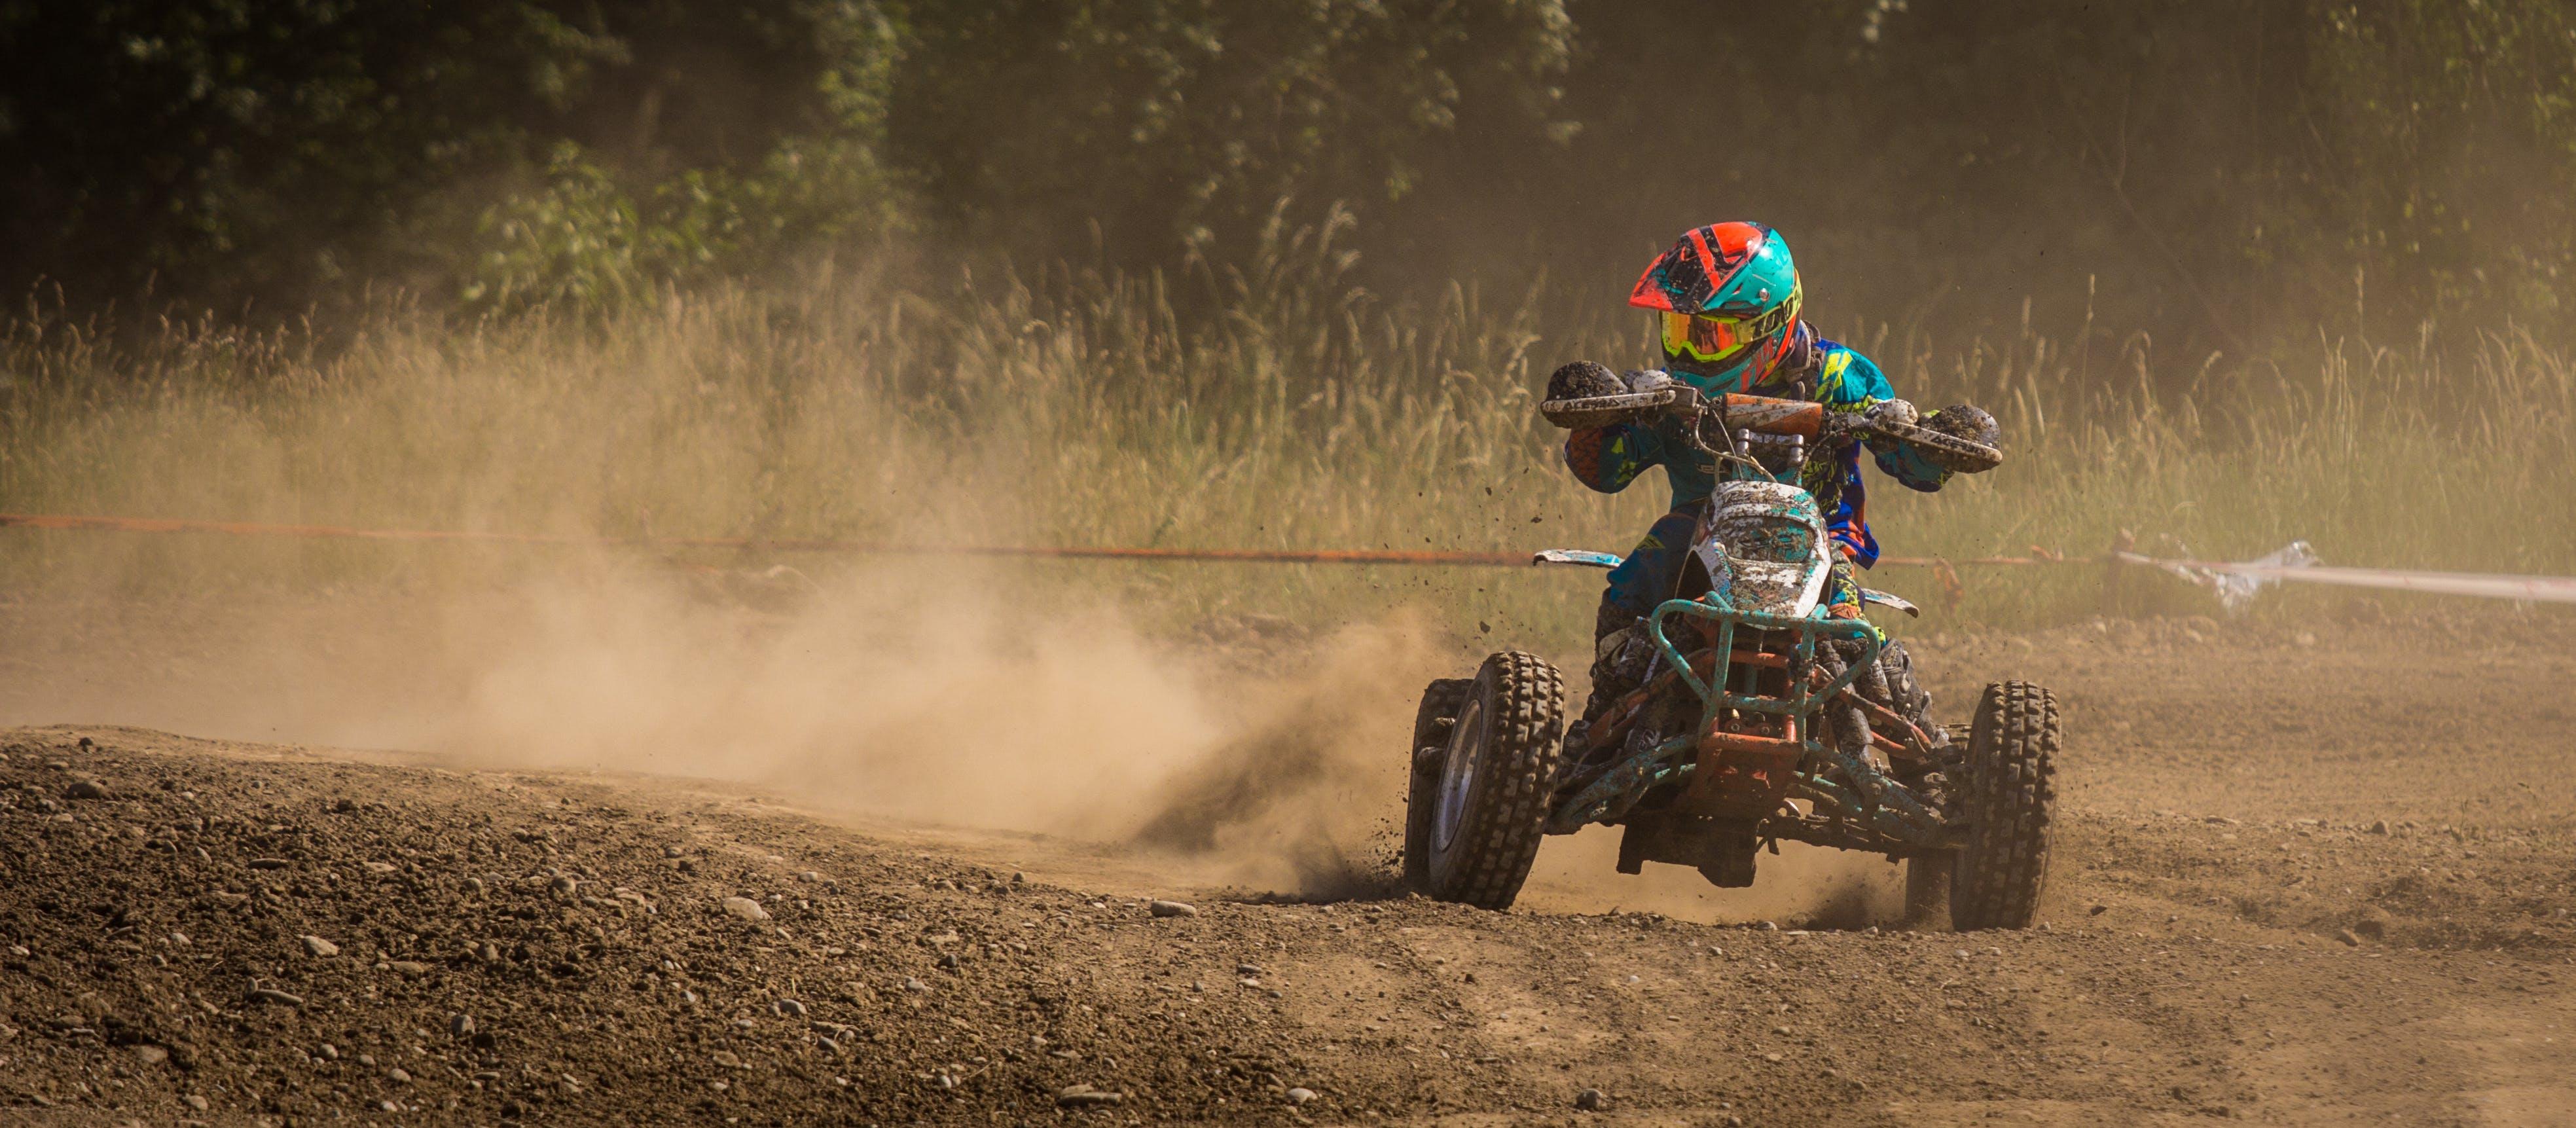 Man Riding Atv on Race Track